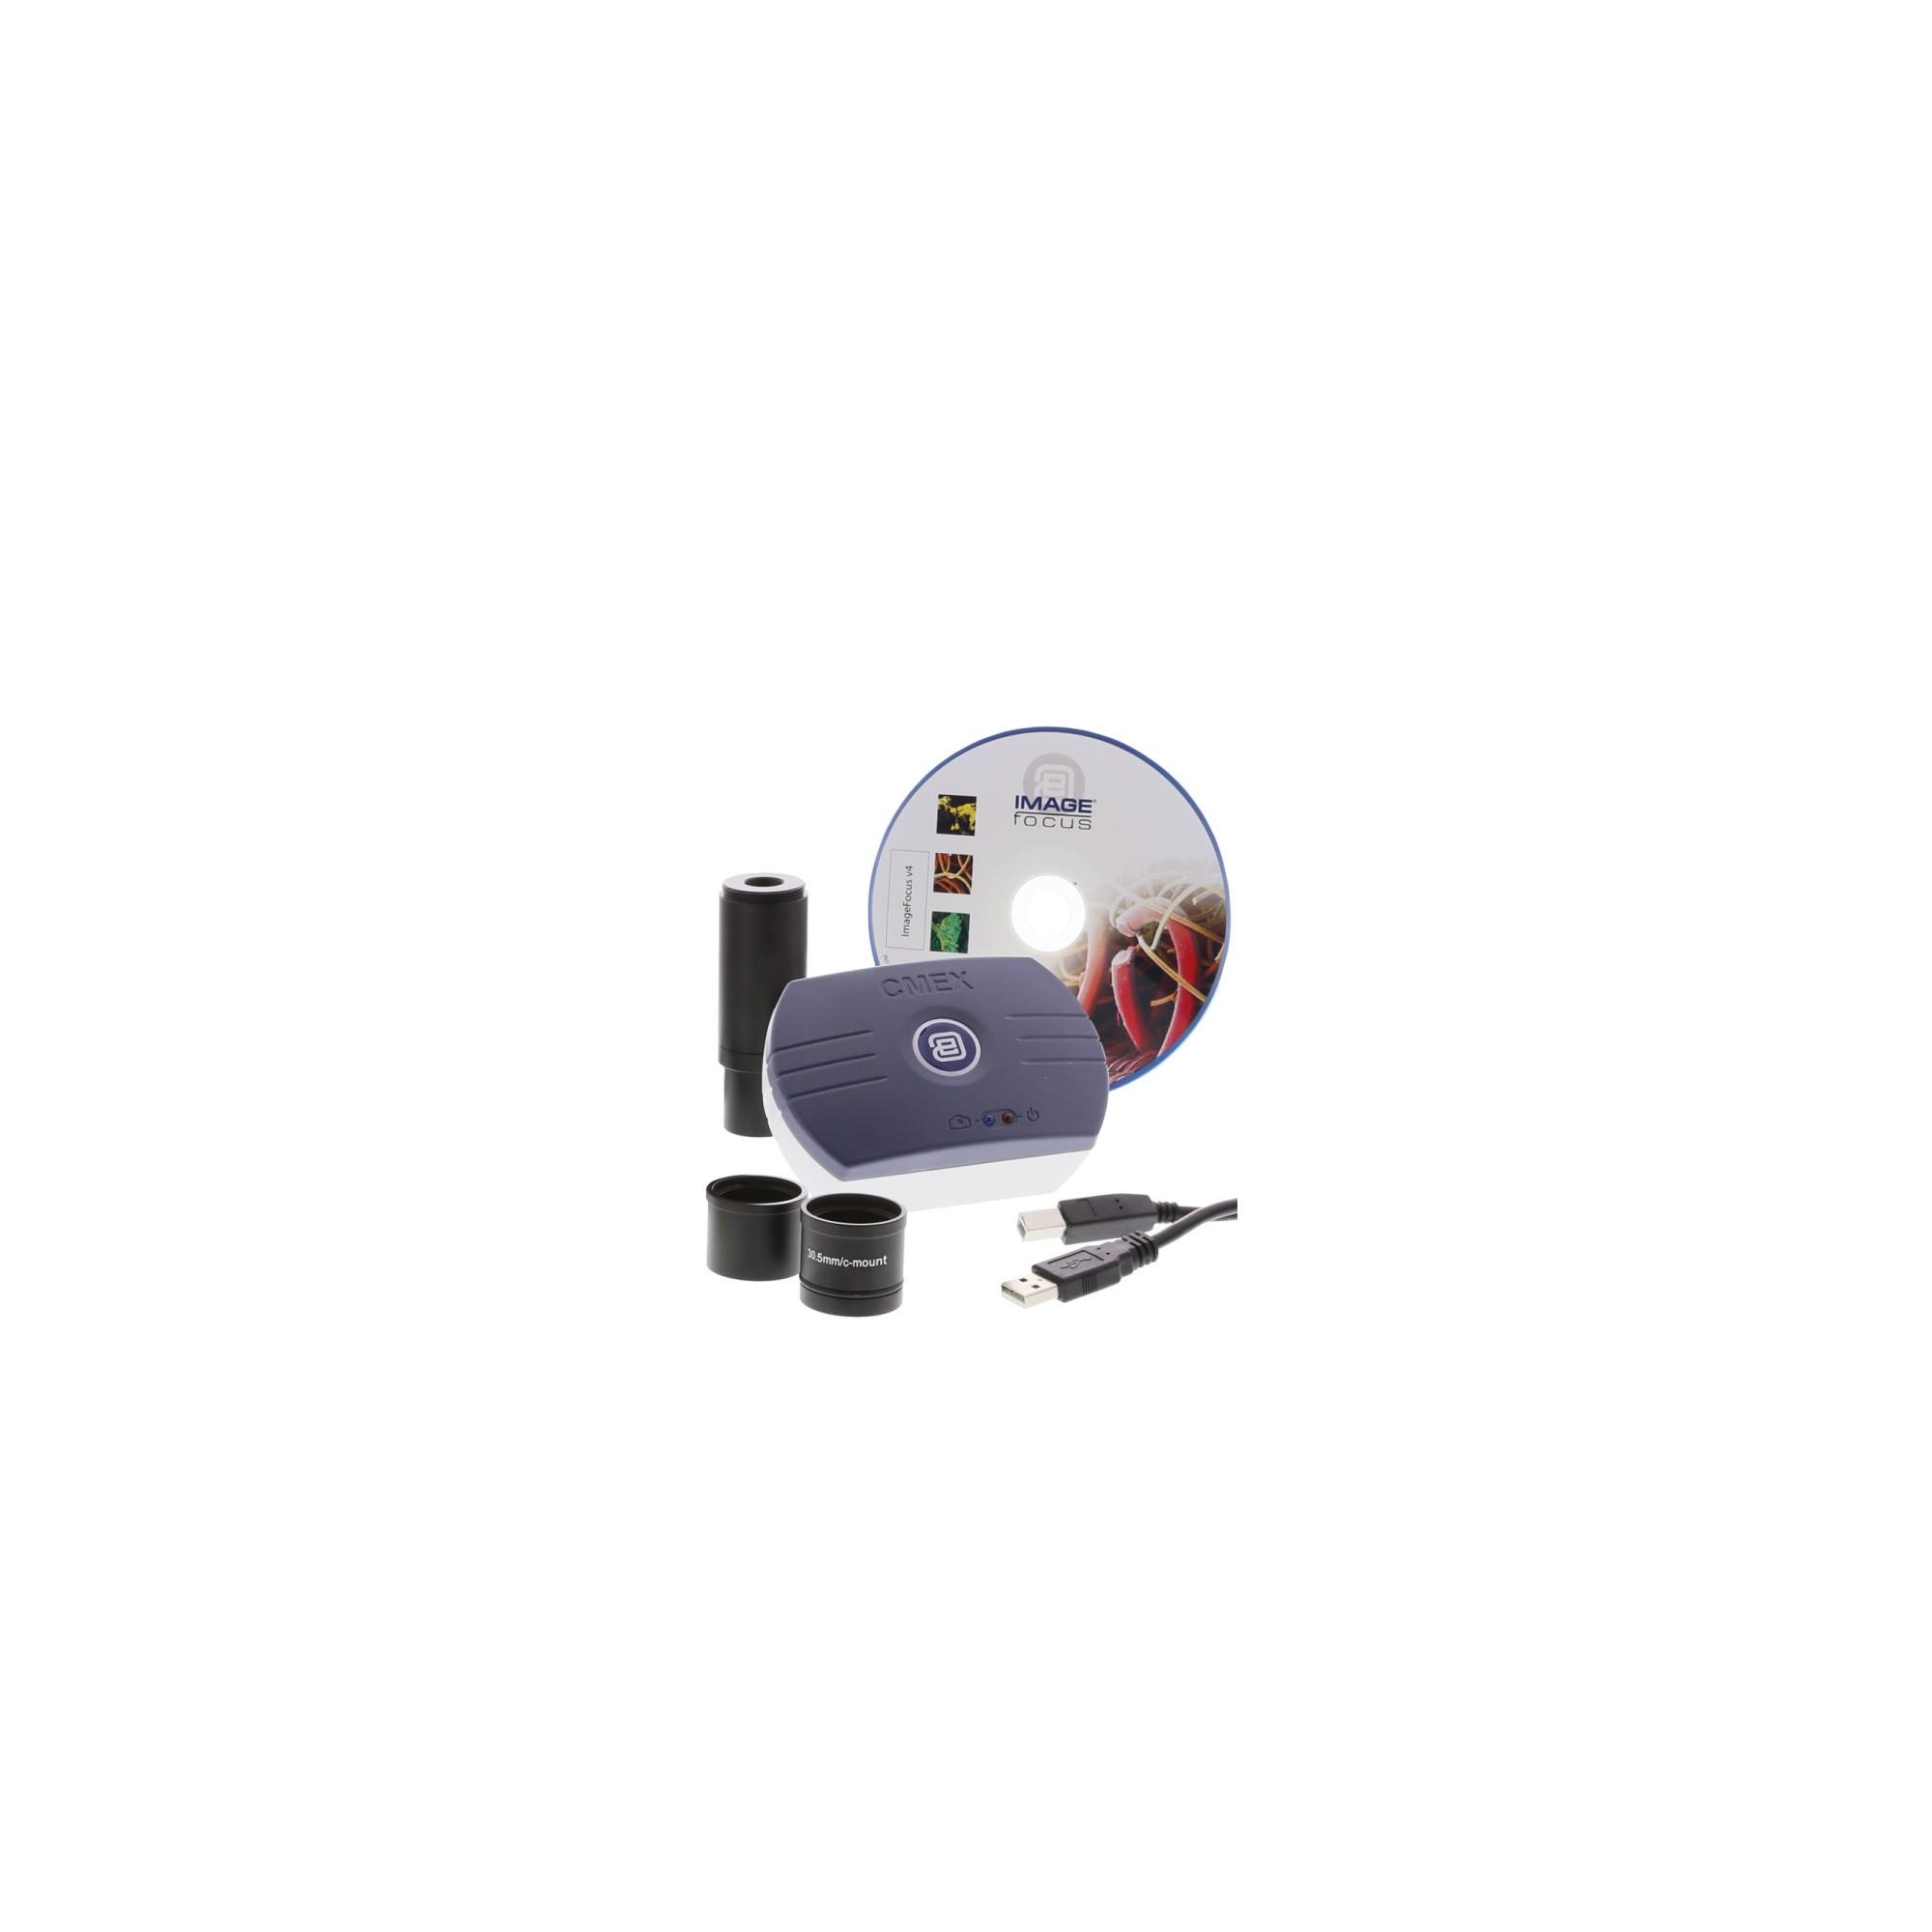 CÁMARA DIGITAL USB-2 MODELO CMEX-1 (1,3 MP)